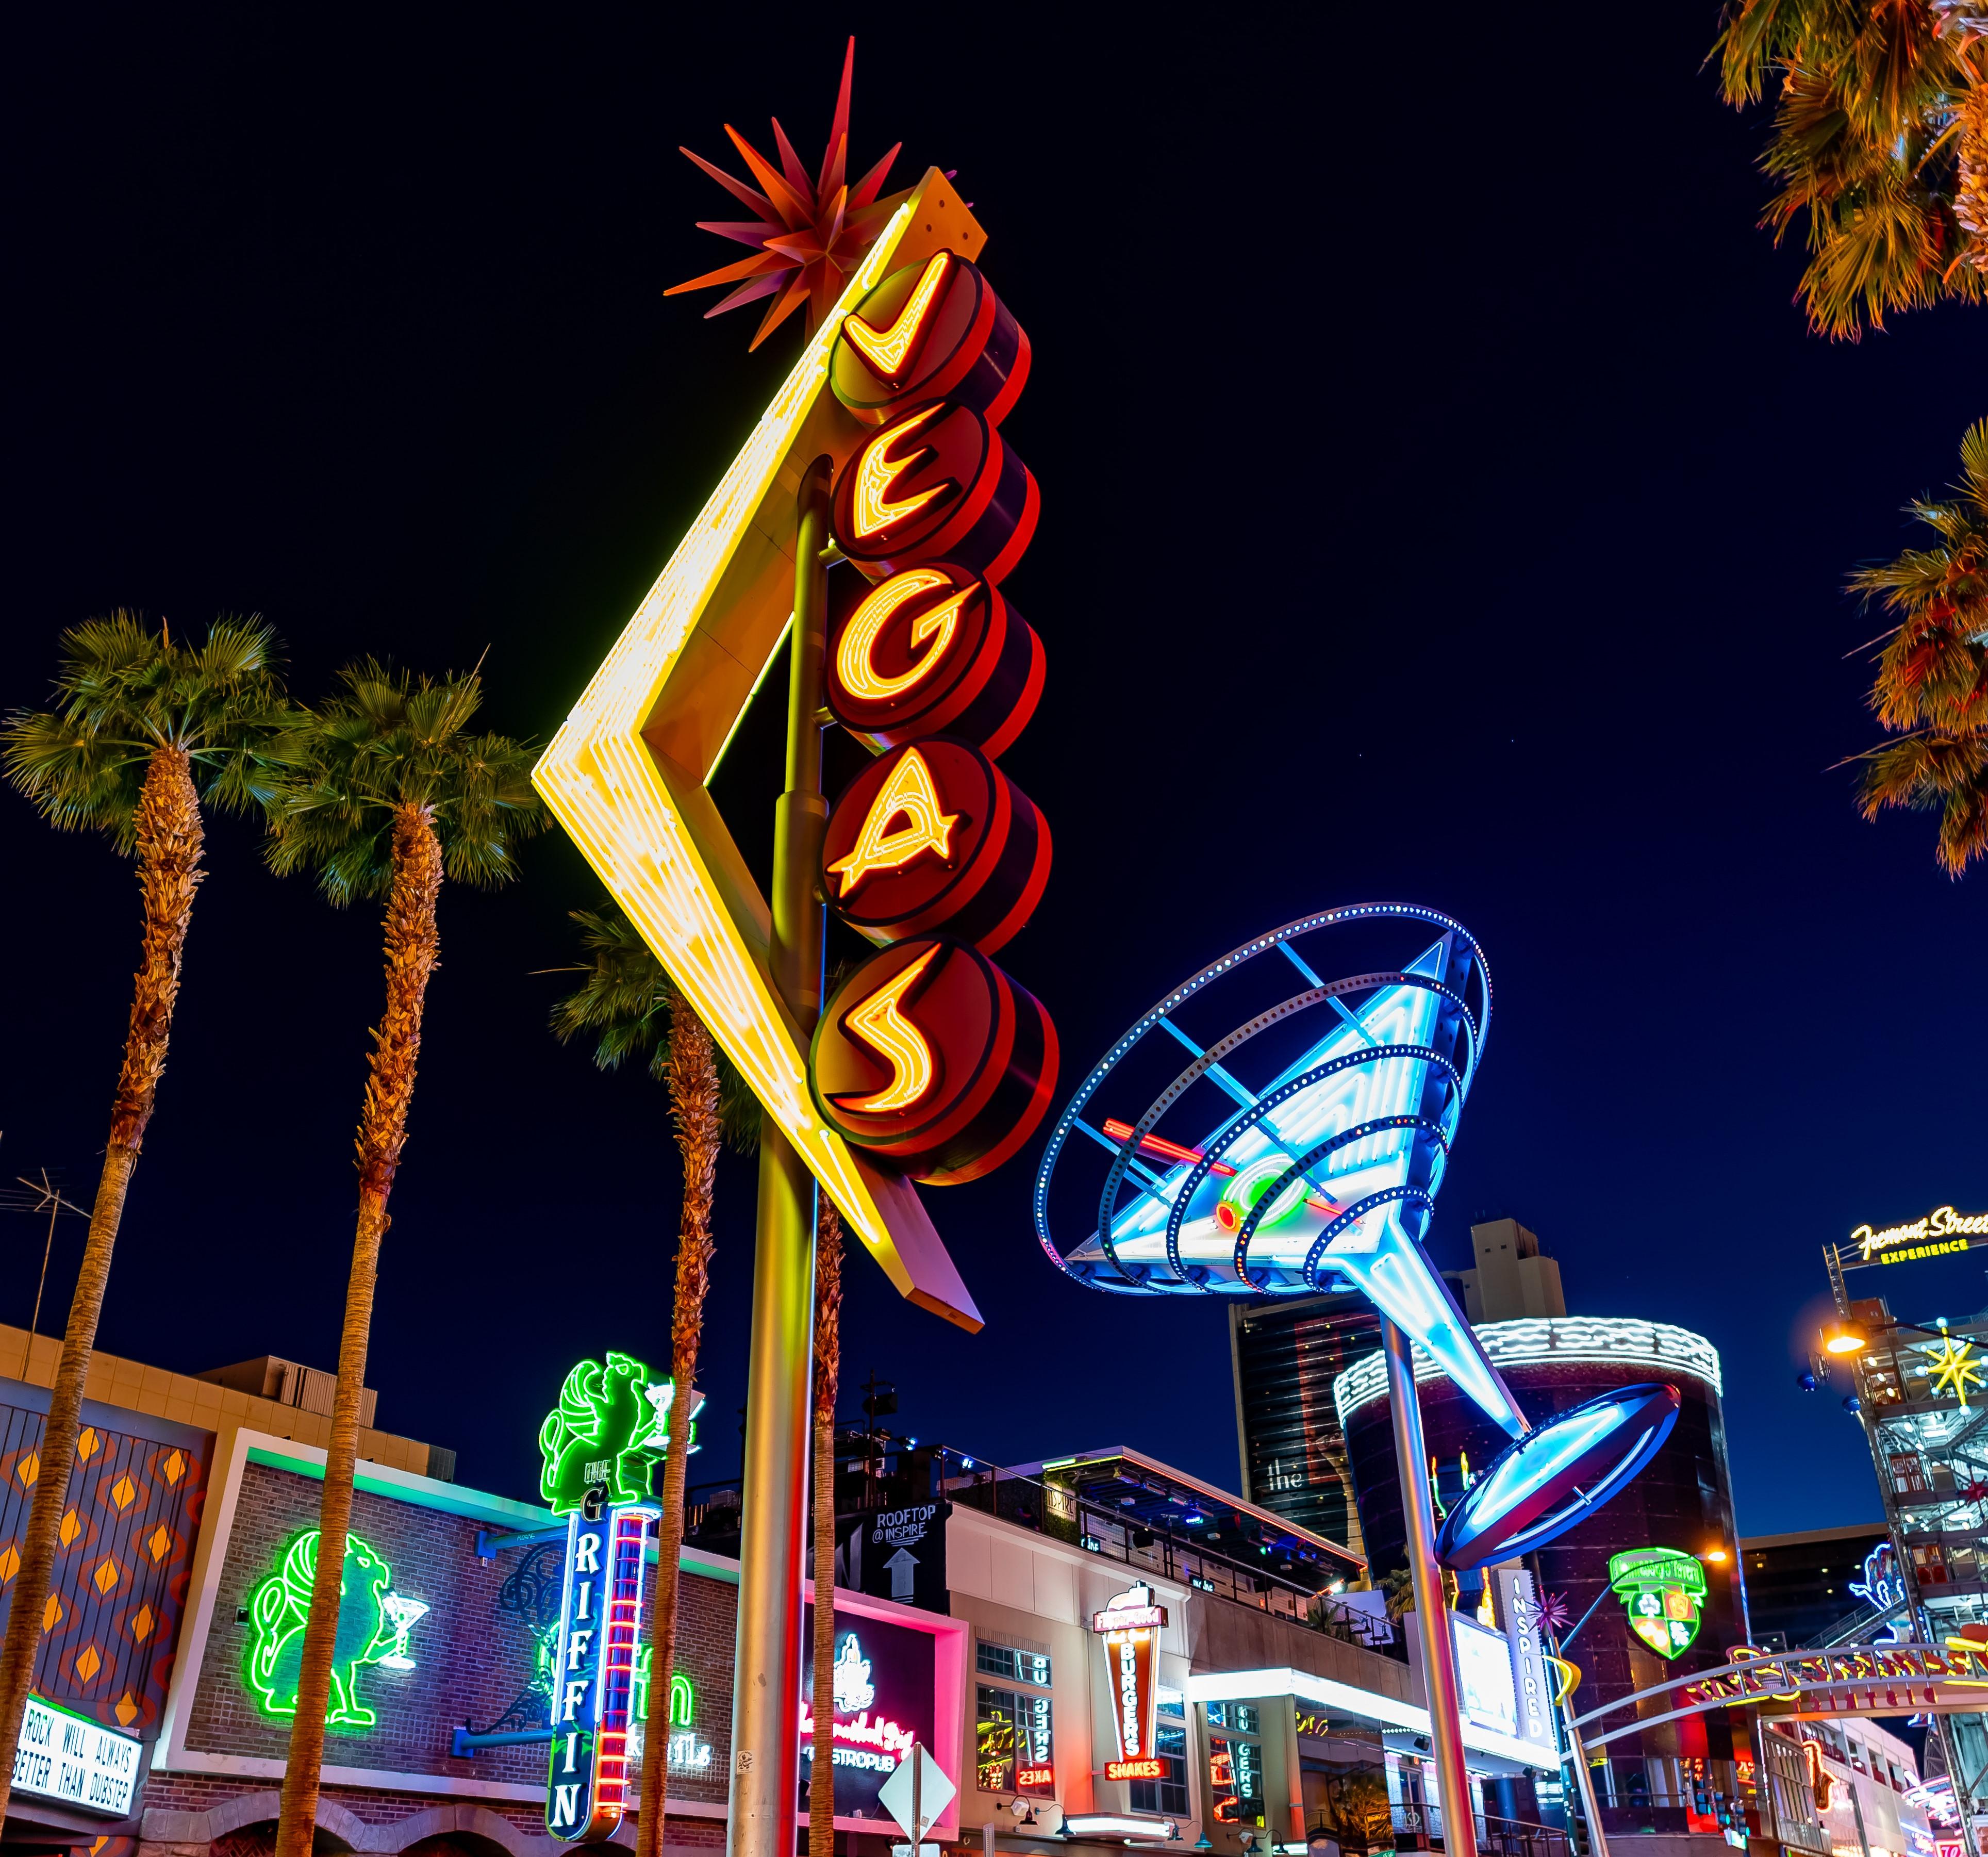 Downtown Las Vegas - LasVegasRealEstate.com - Photo by McKenzie Woodcock